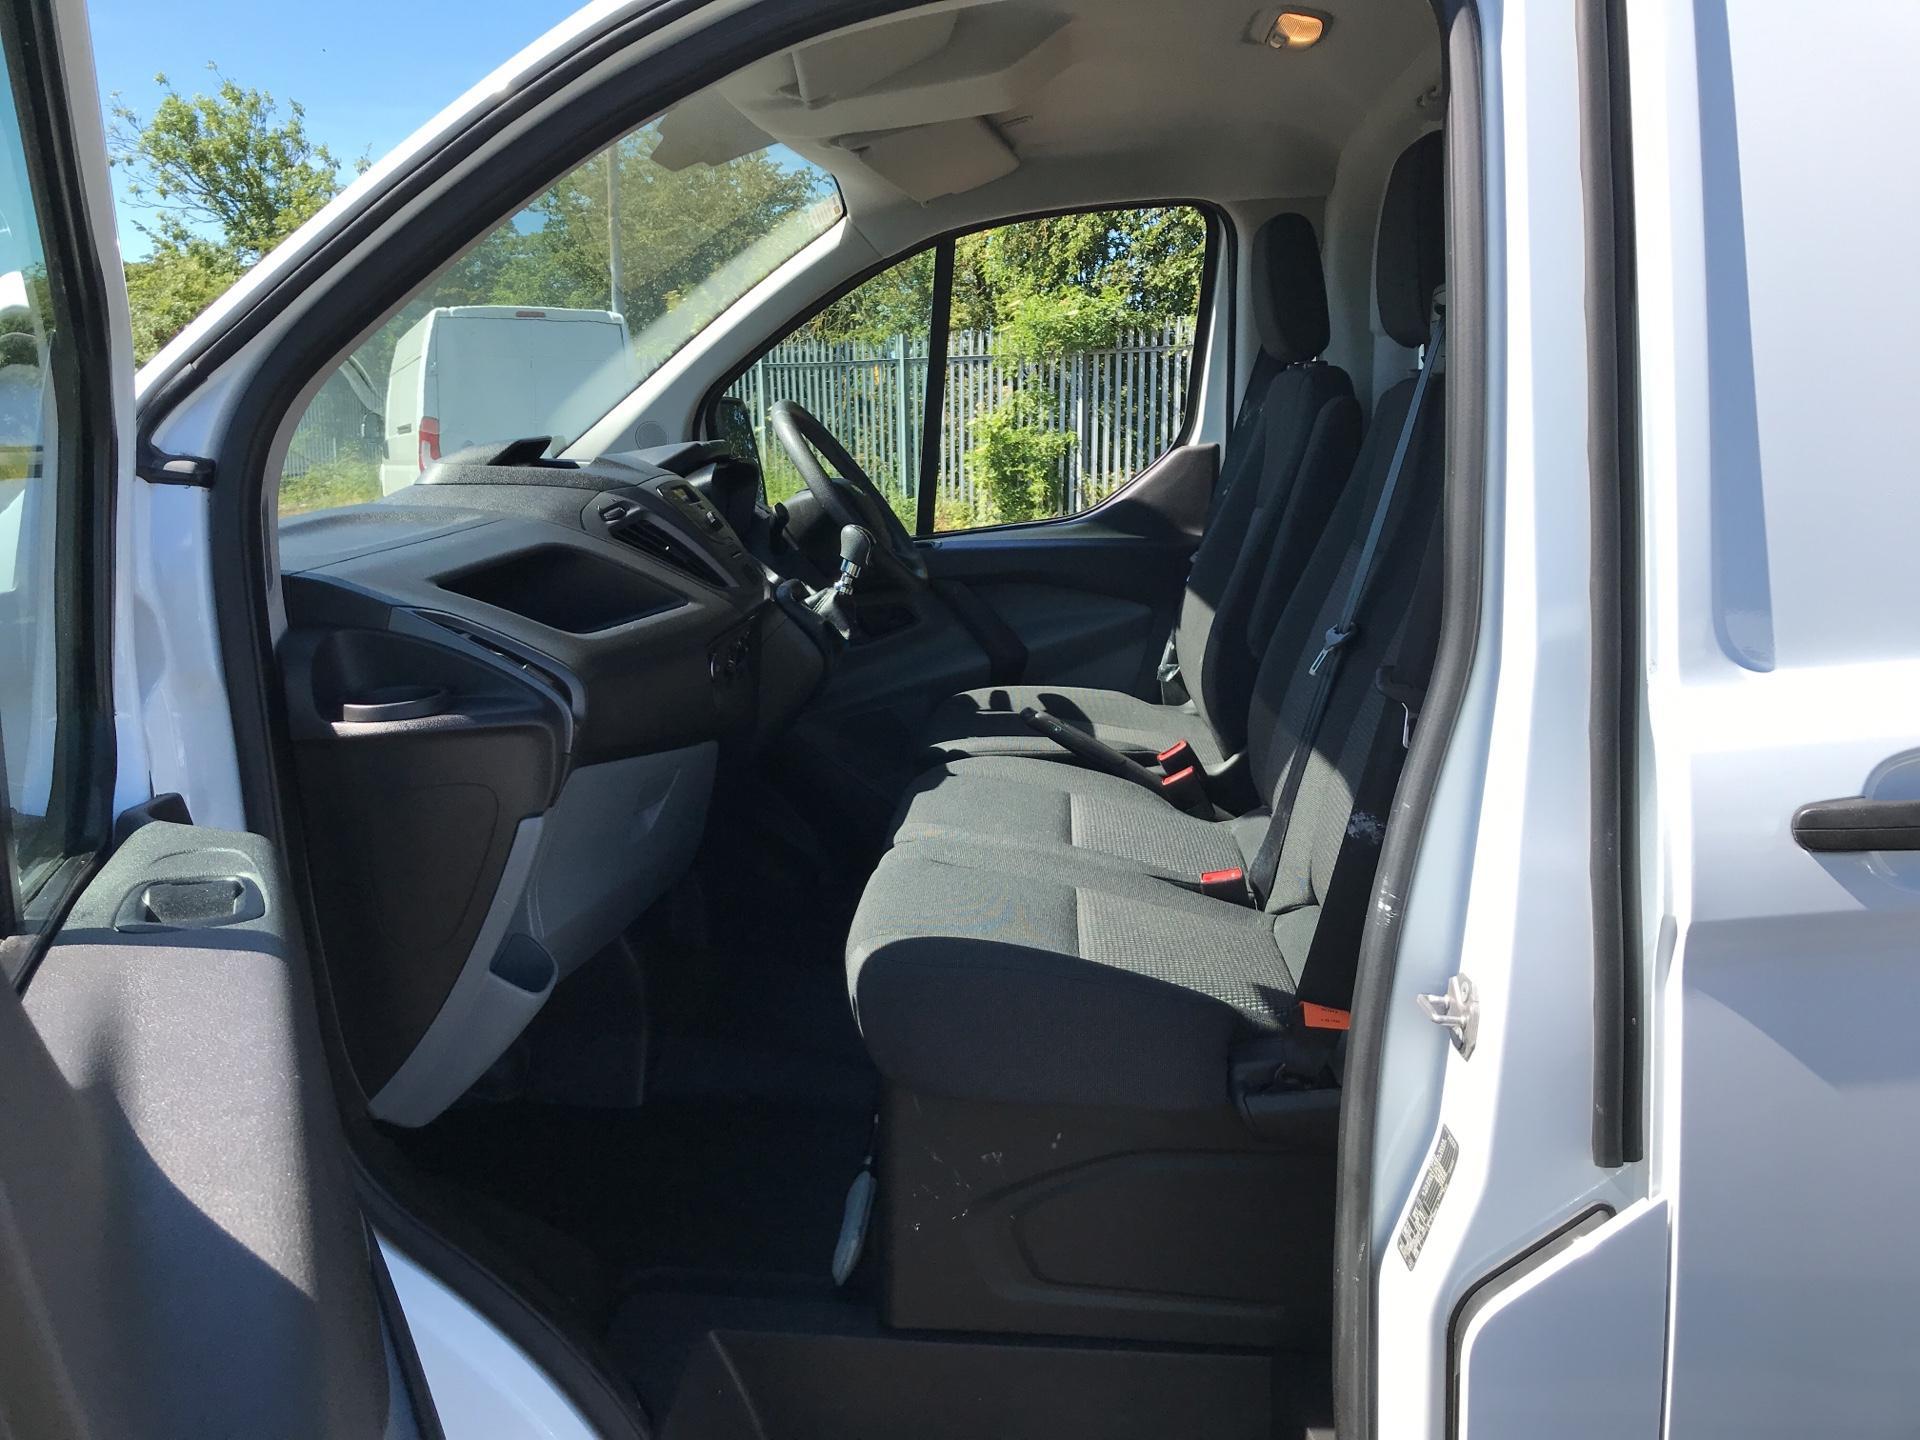 2014 Ford Transit Custom 270 L1 DIESEL FWD 2.2 Tdci 100Ps Low Roof Van EURO 5 (SG64ZHB) Image 14